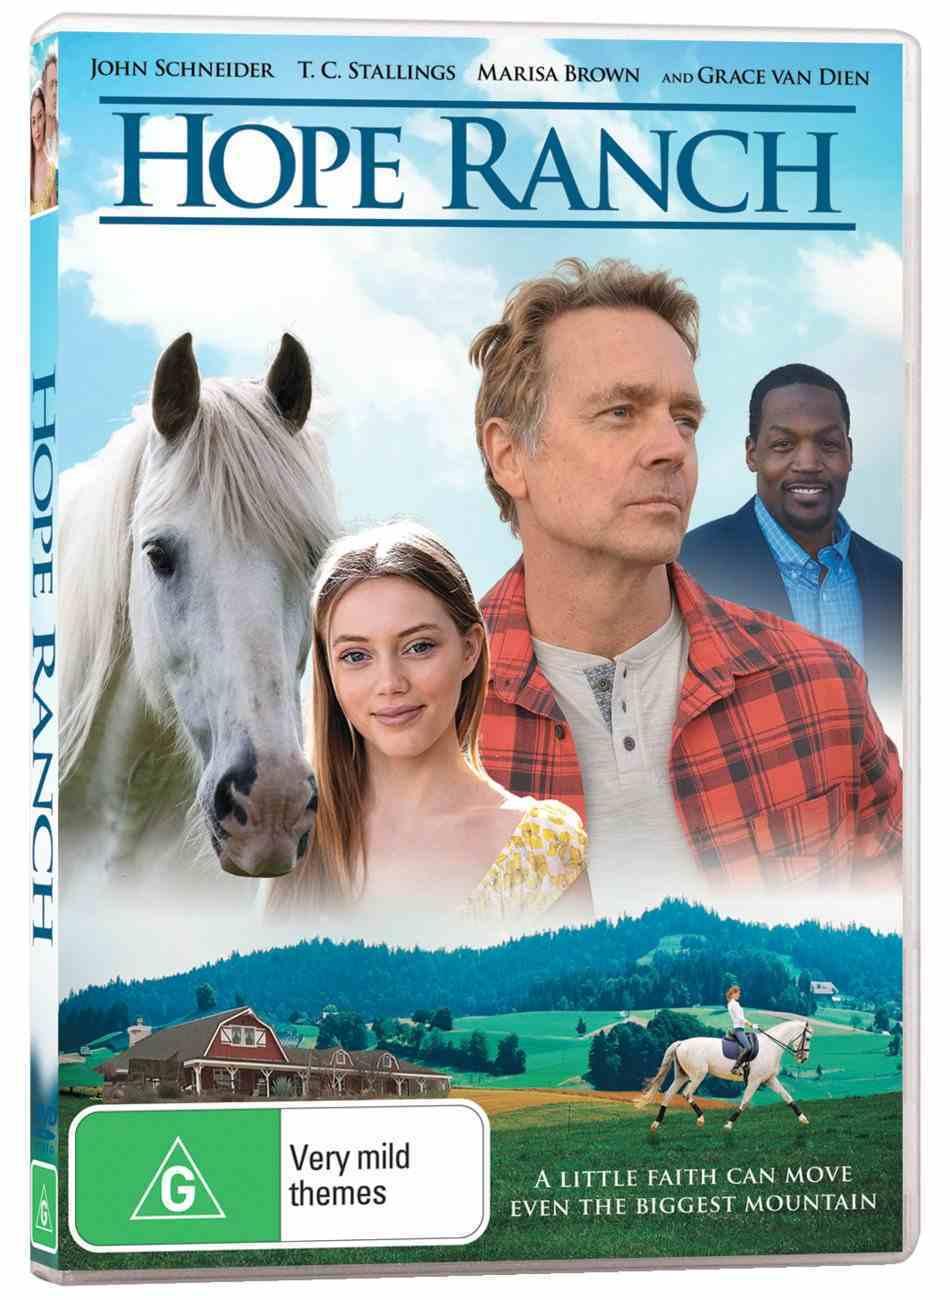 Hope Ranch image